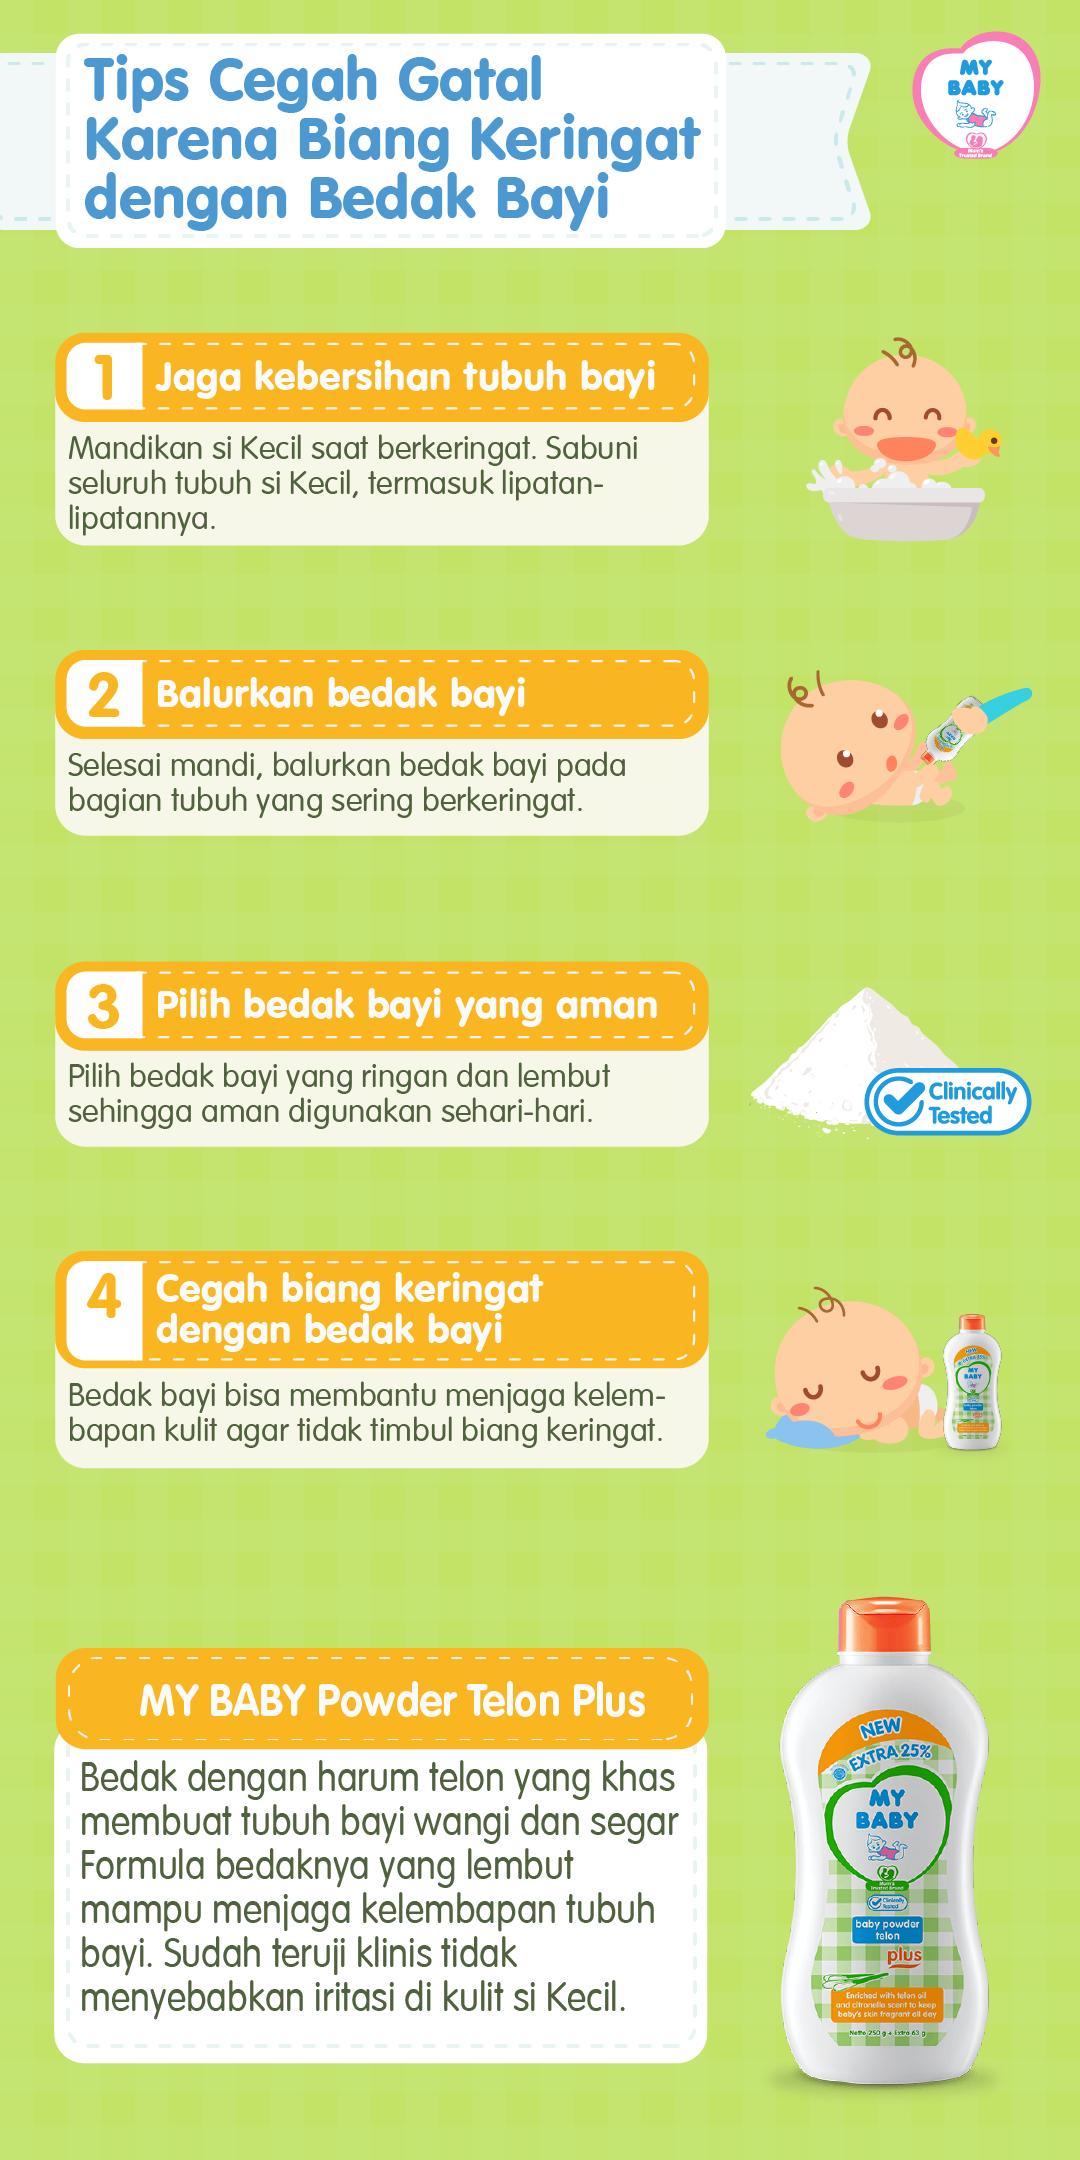 Tips Cegah Gatal dengan Bedak Bayi untuk Biang Keringat